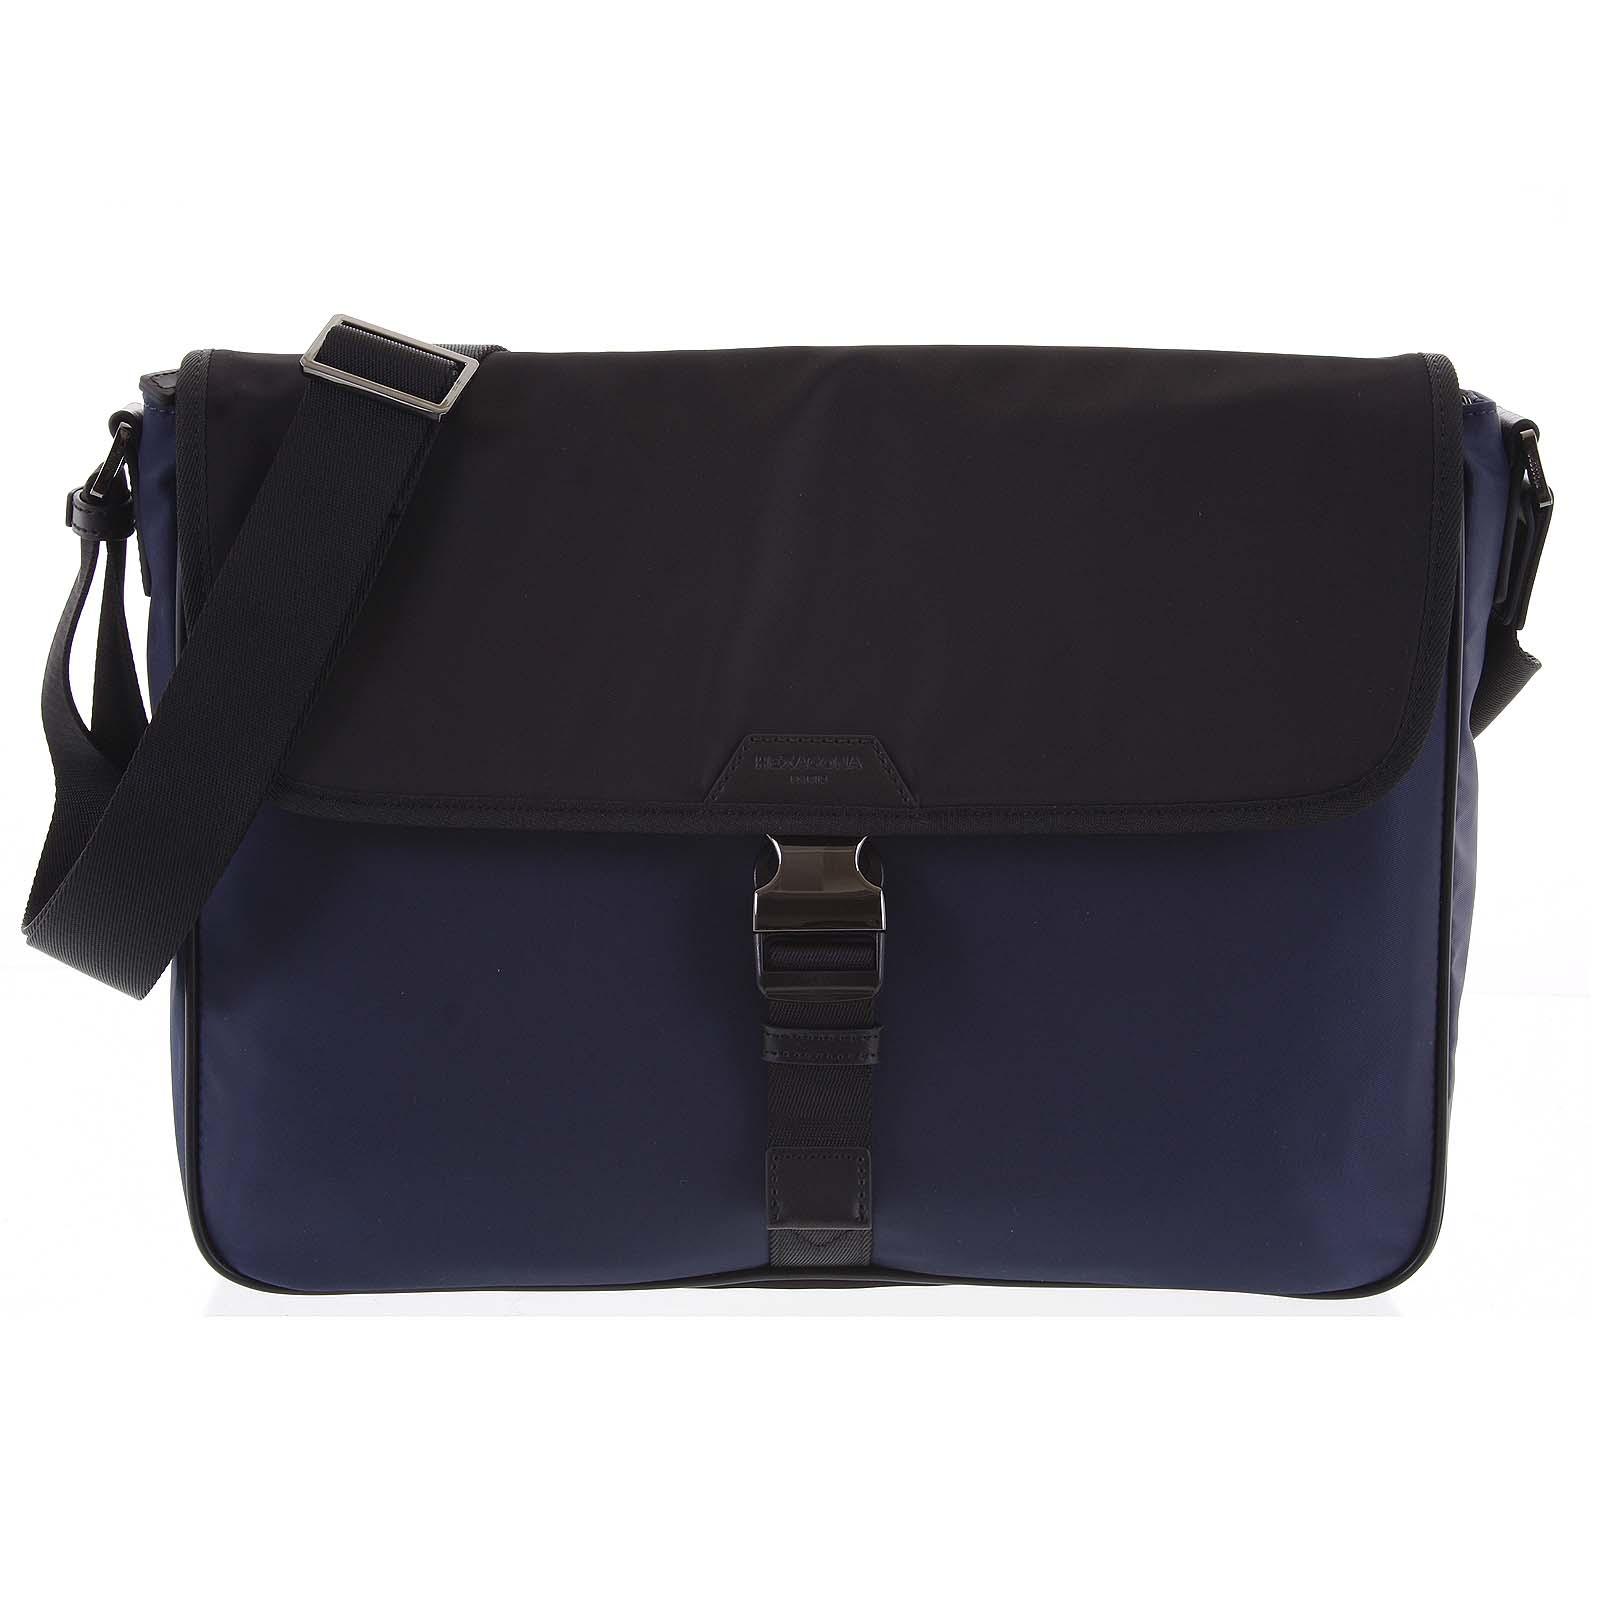 Crossbody taška na notebook modro čierna - Hexagona Baccus